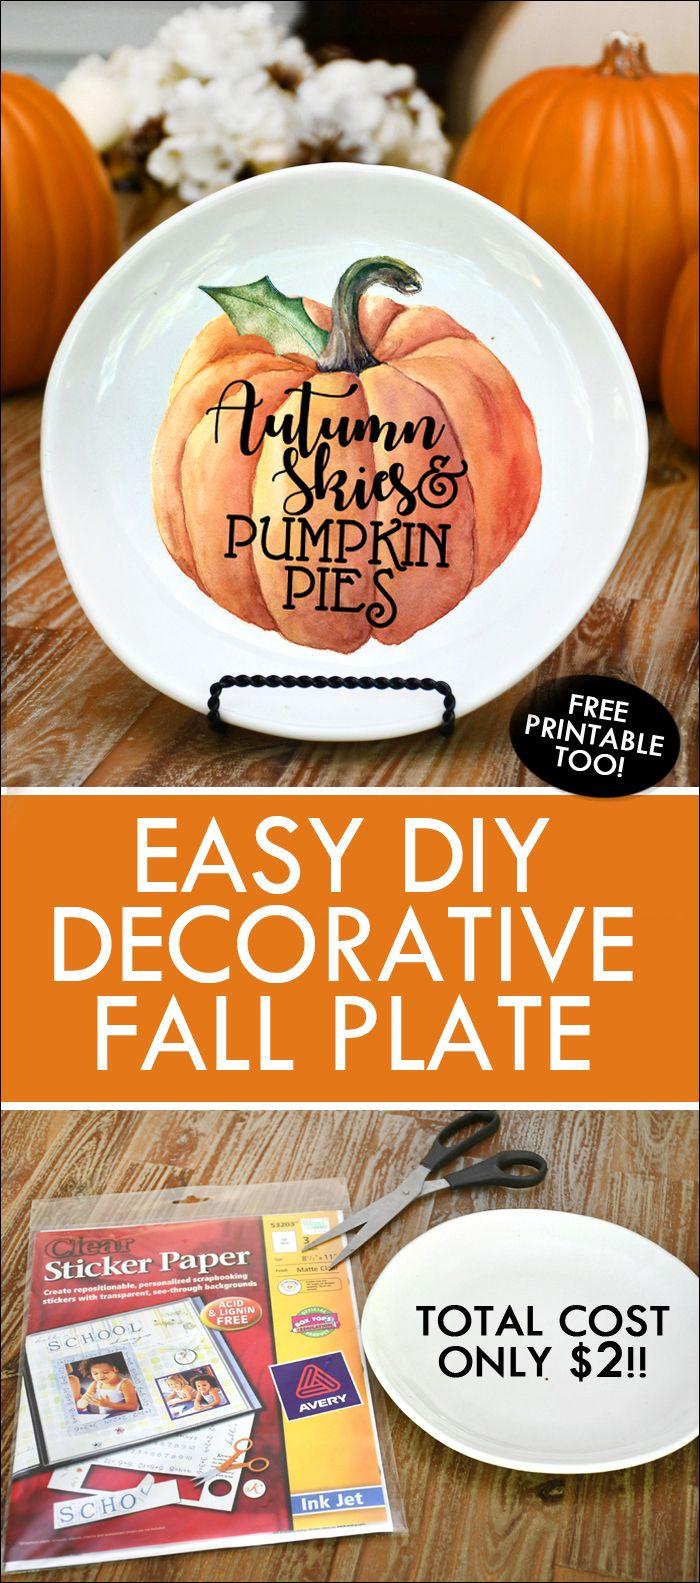 DIY Pumpkin Fall Decorative Plate - Under $2 to Make! & DIY Pumpkin Fall Decorative Plate - Under $2 to Make!   Fall ...